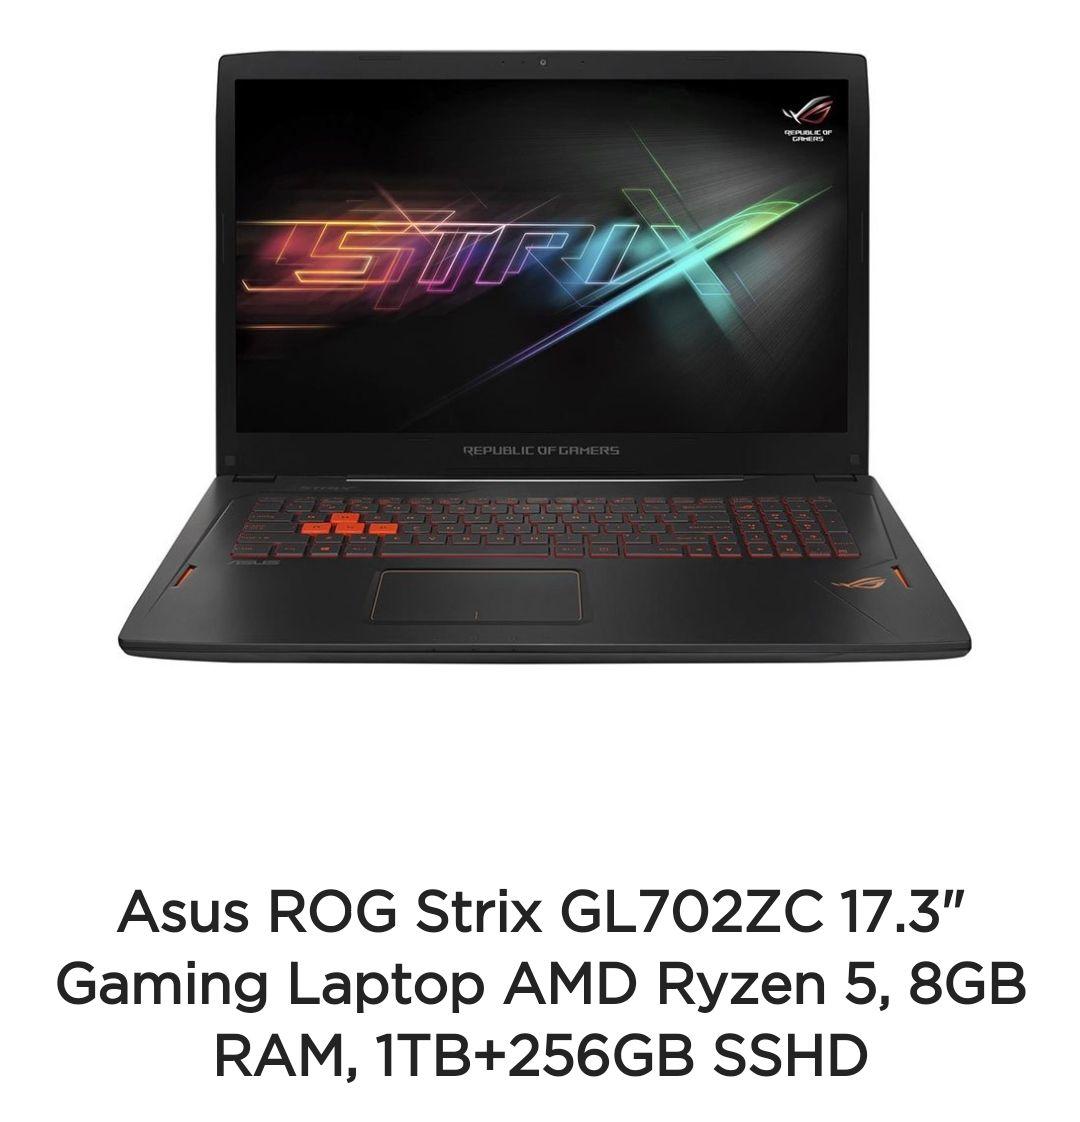 Asus ROG Strix GL702ZC Gaming laptop £899.97 Asus Shop